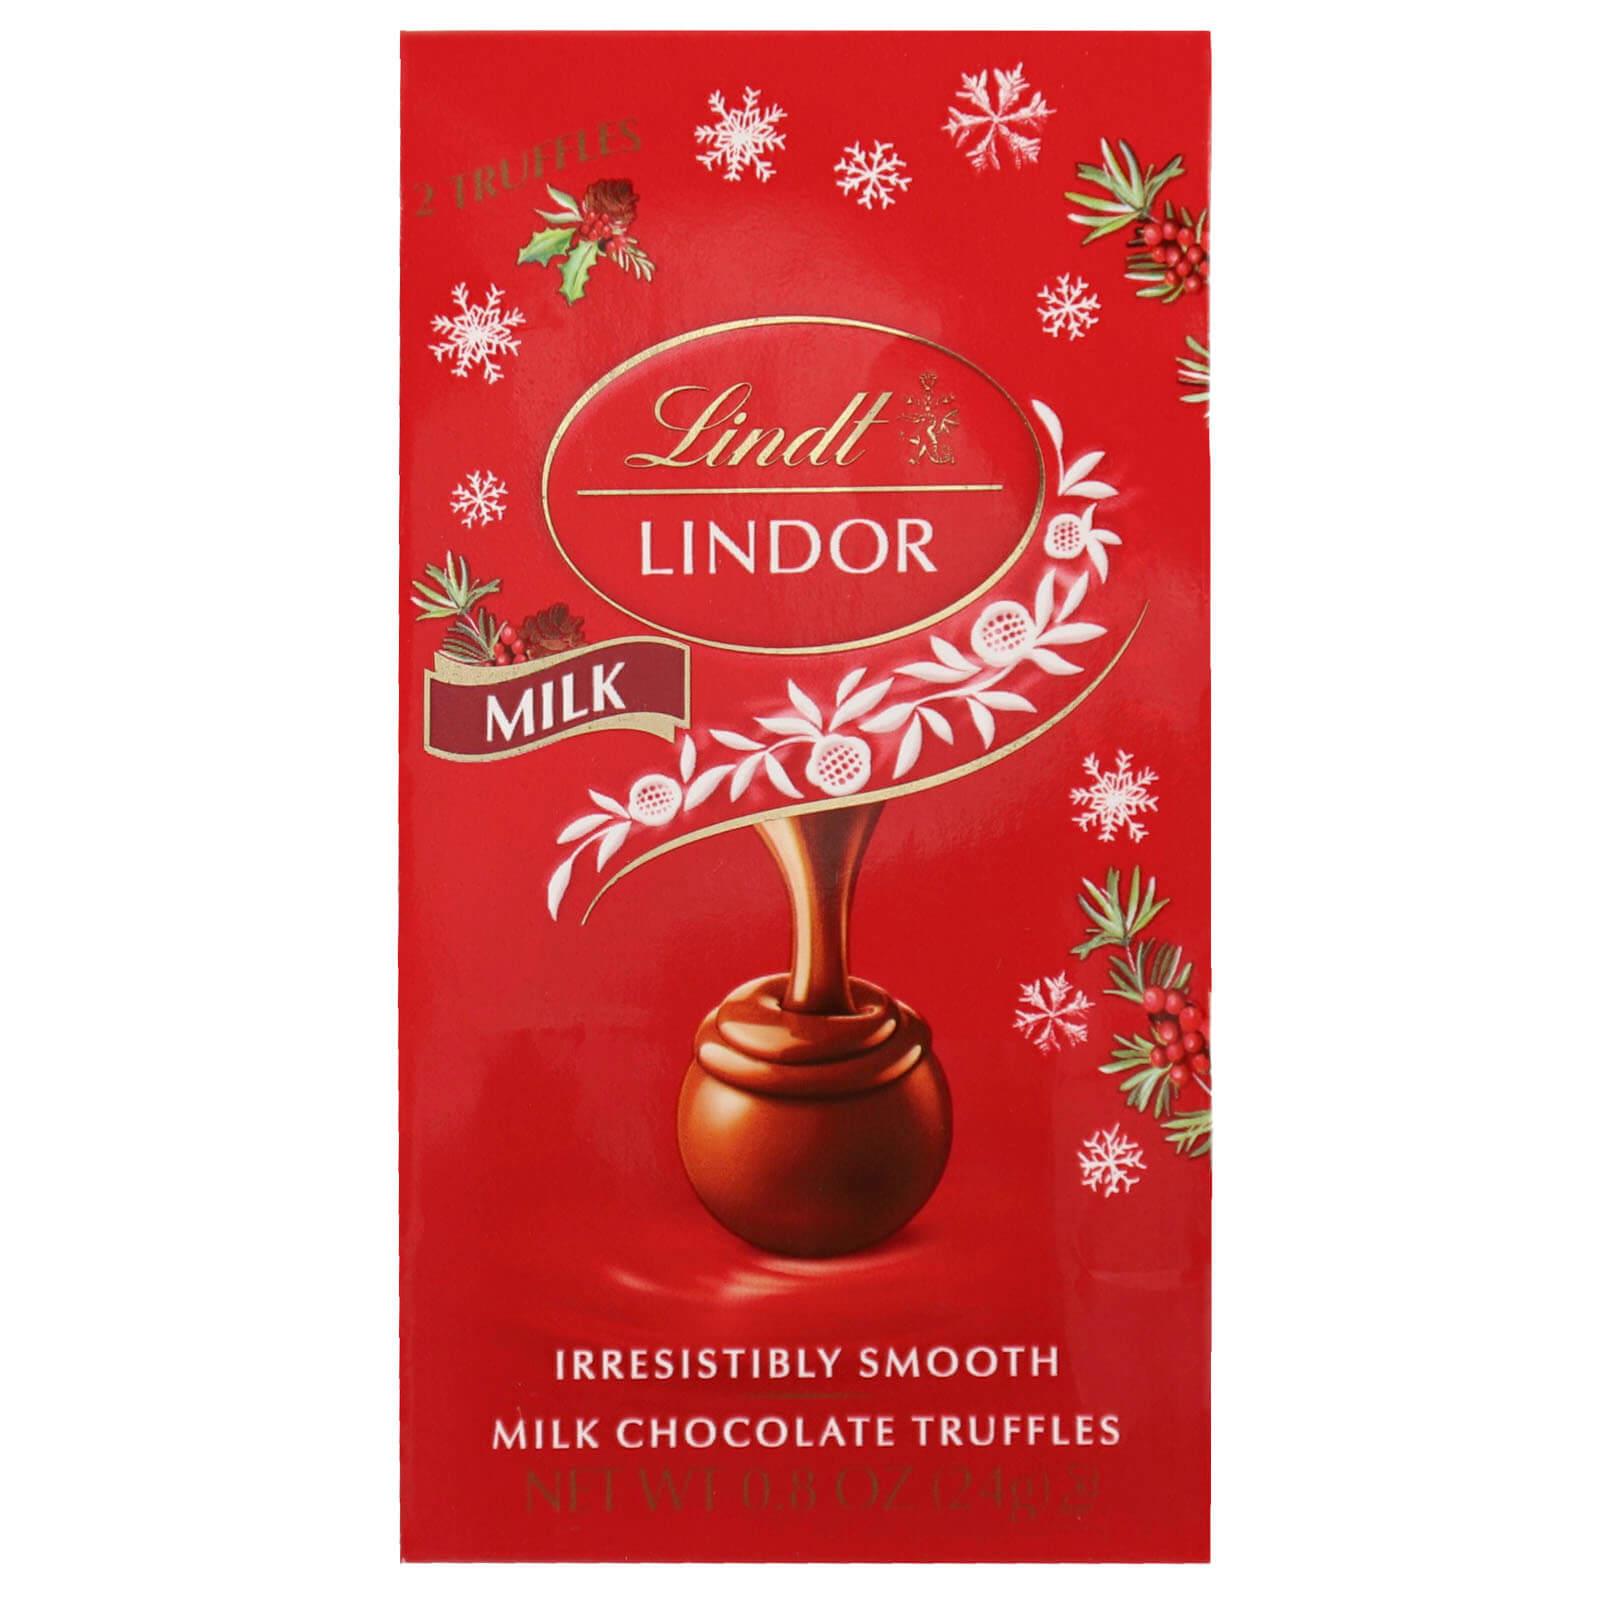 Lindor Milk Chocolate Truffles Mini Bag - Lindt